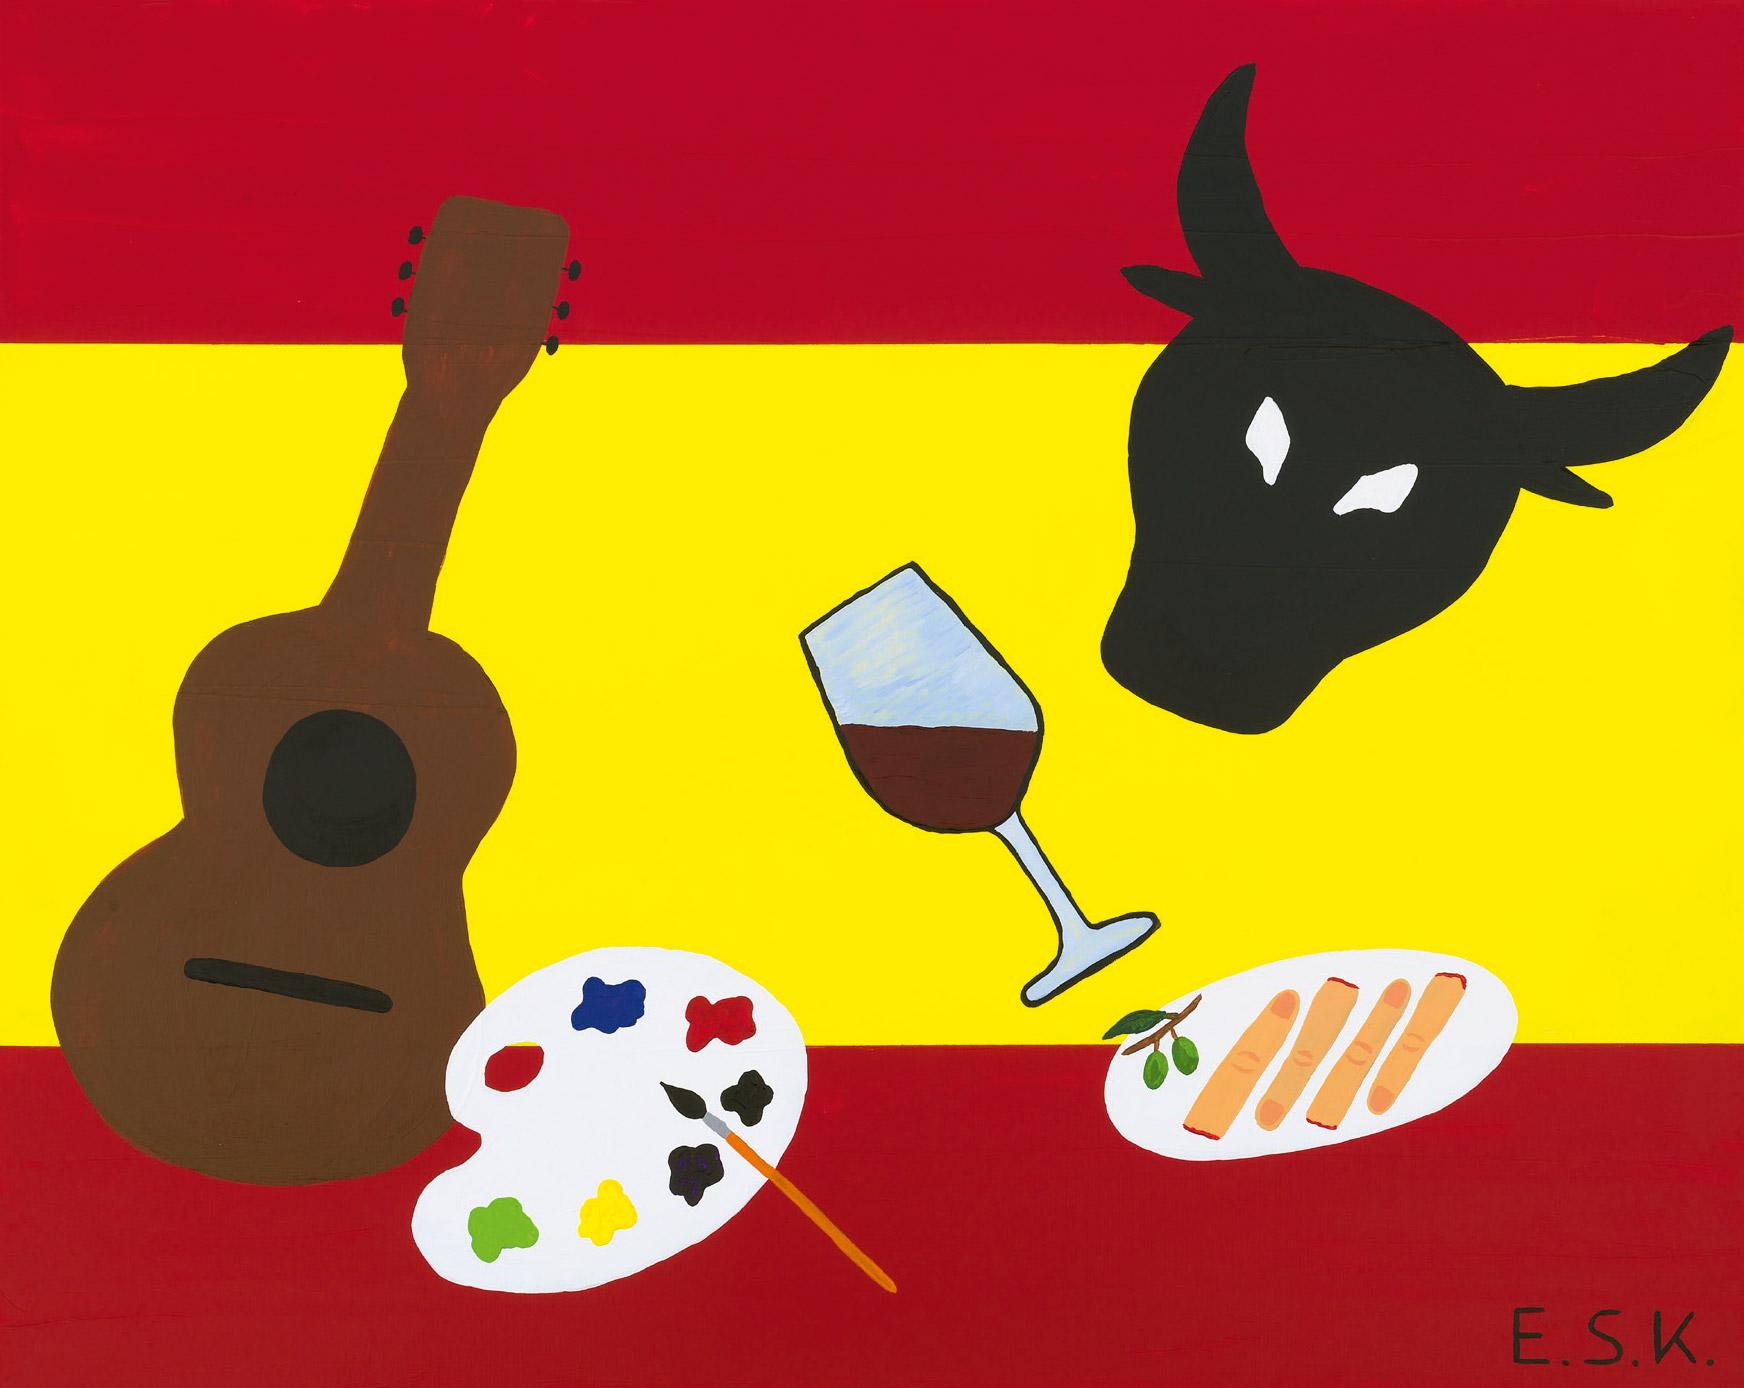 Pop Spanien - Finger Food Art by E.S.K. Eileen Susanne Kreipl